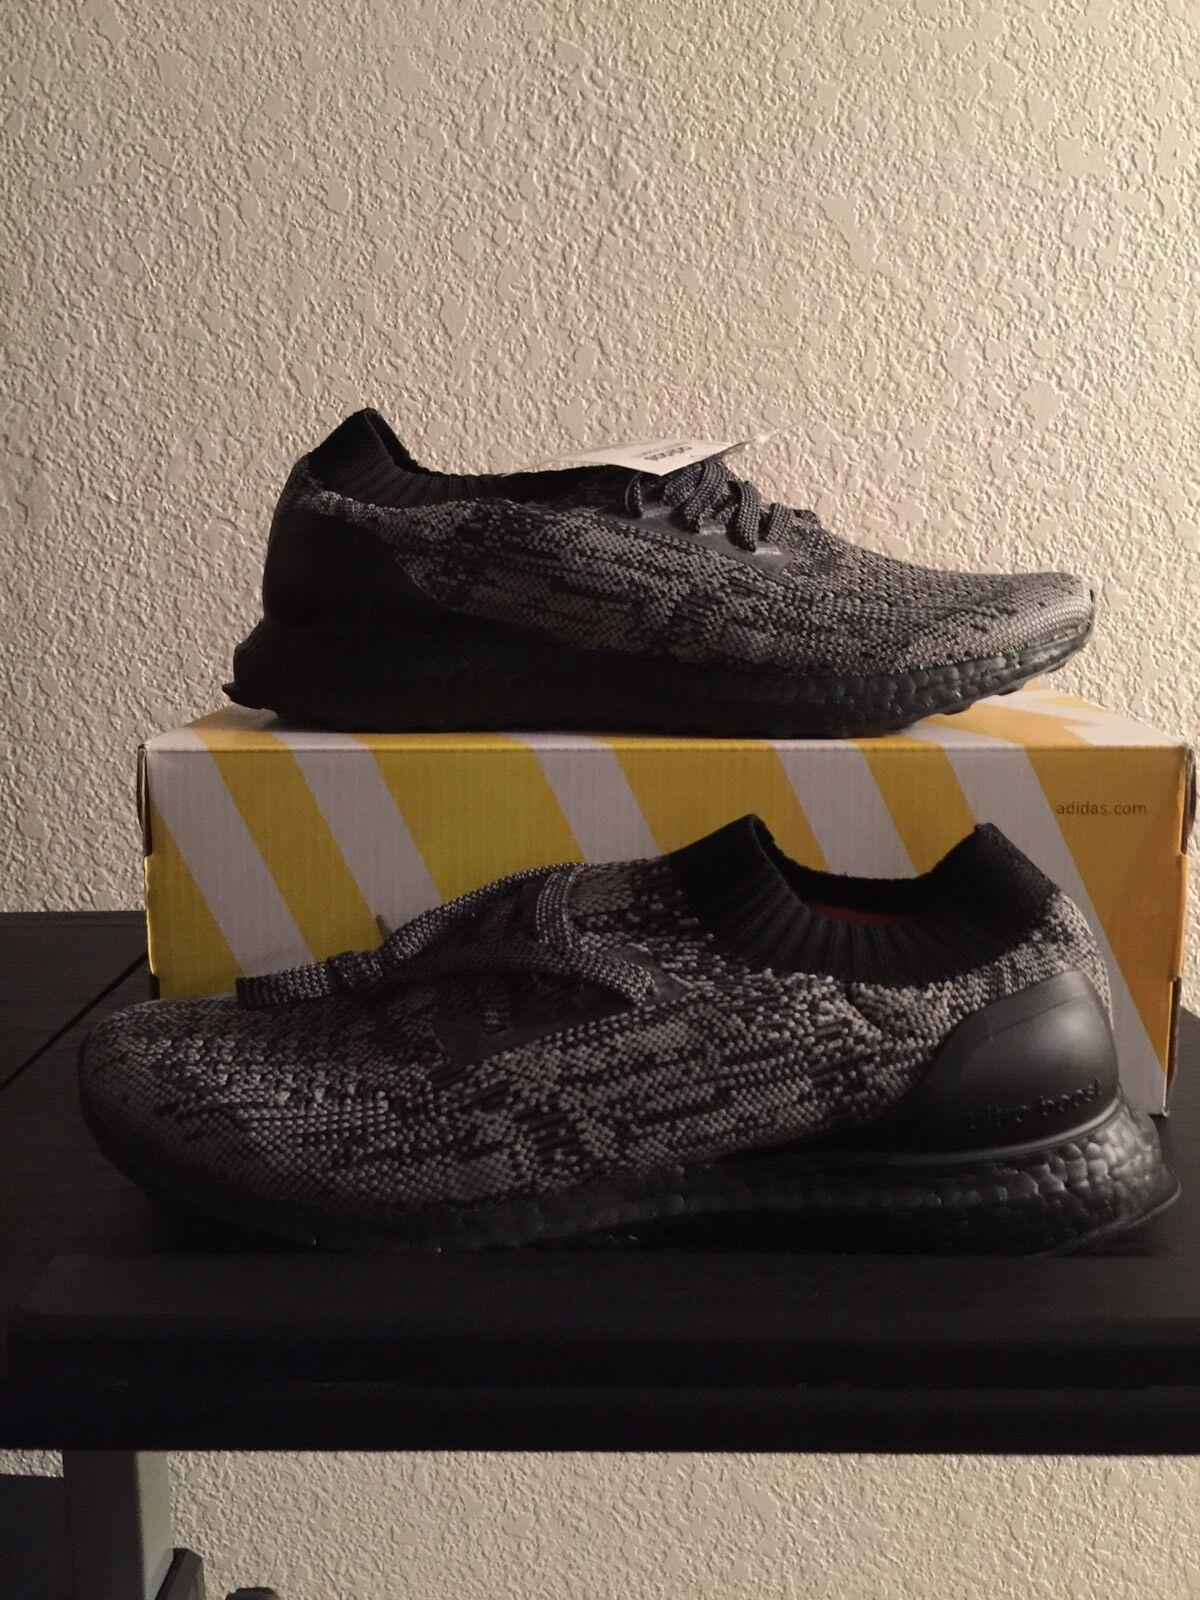 New 2016 Adidas Ultra Boost Uncaged LTD Men Black BB4679 Size 9.5